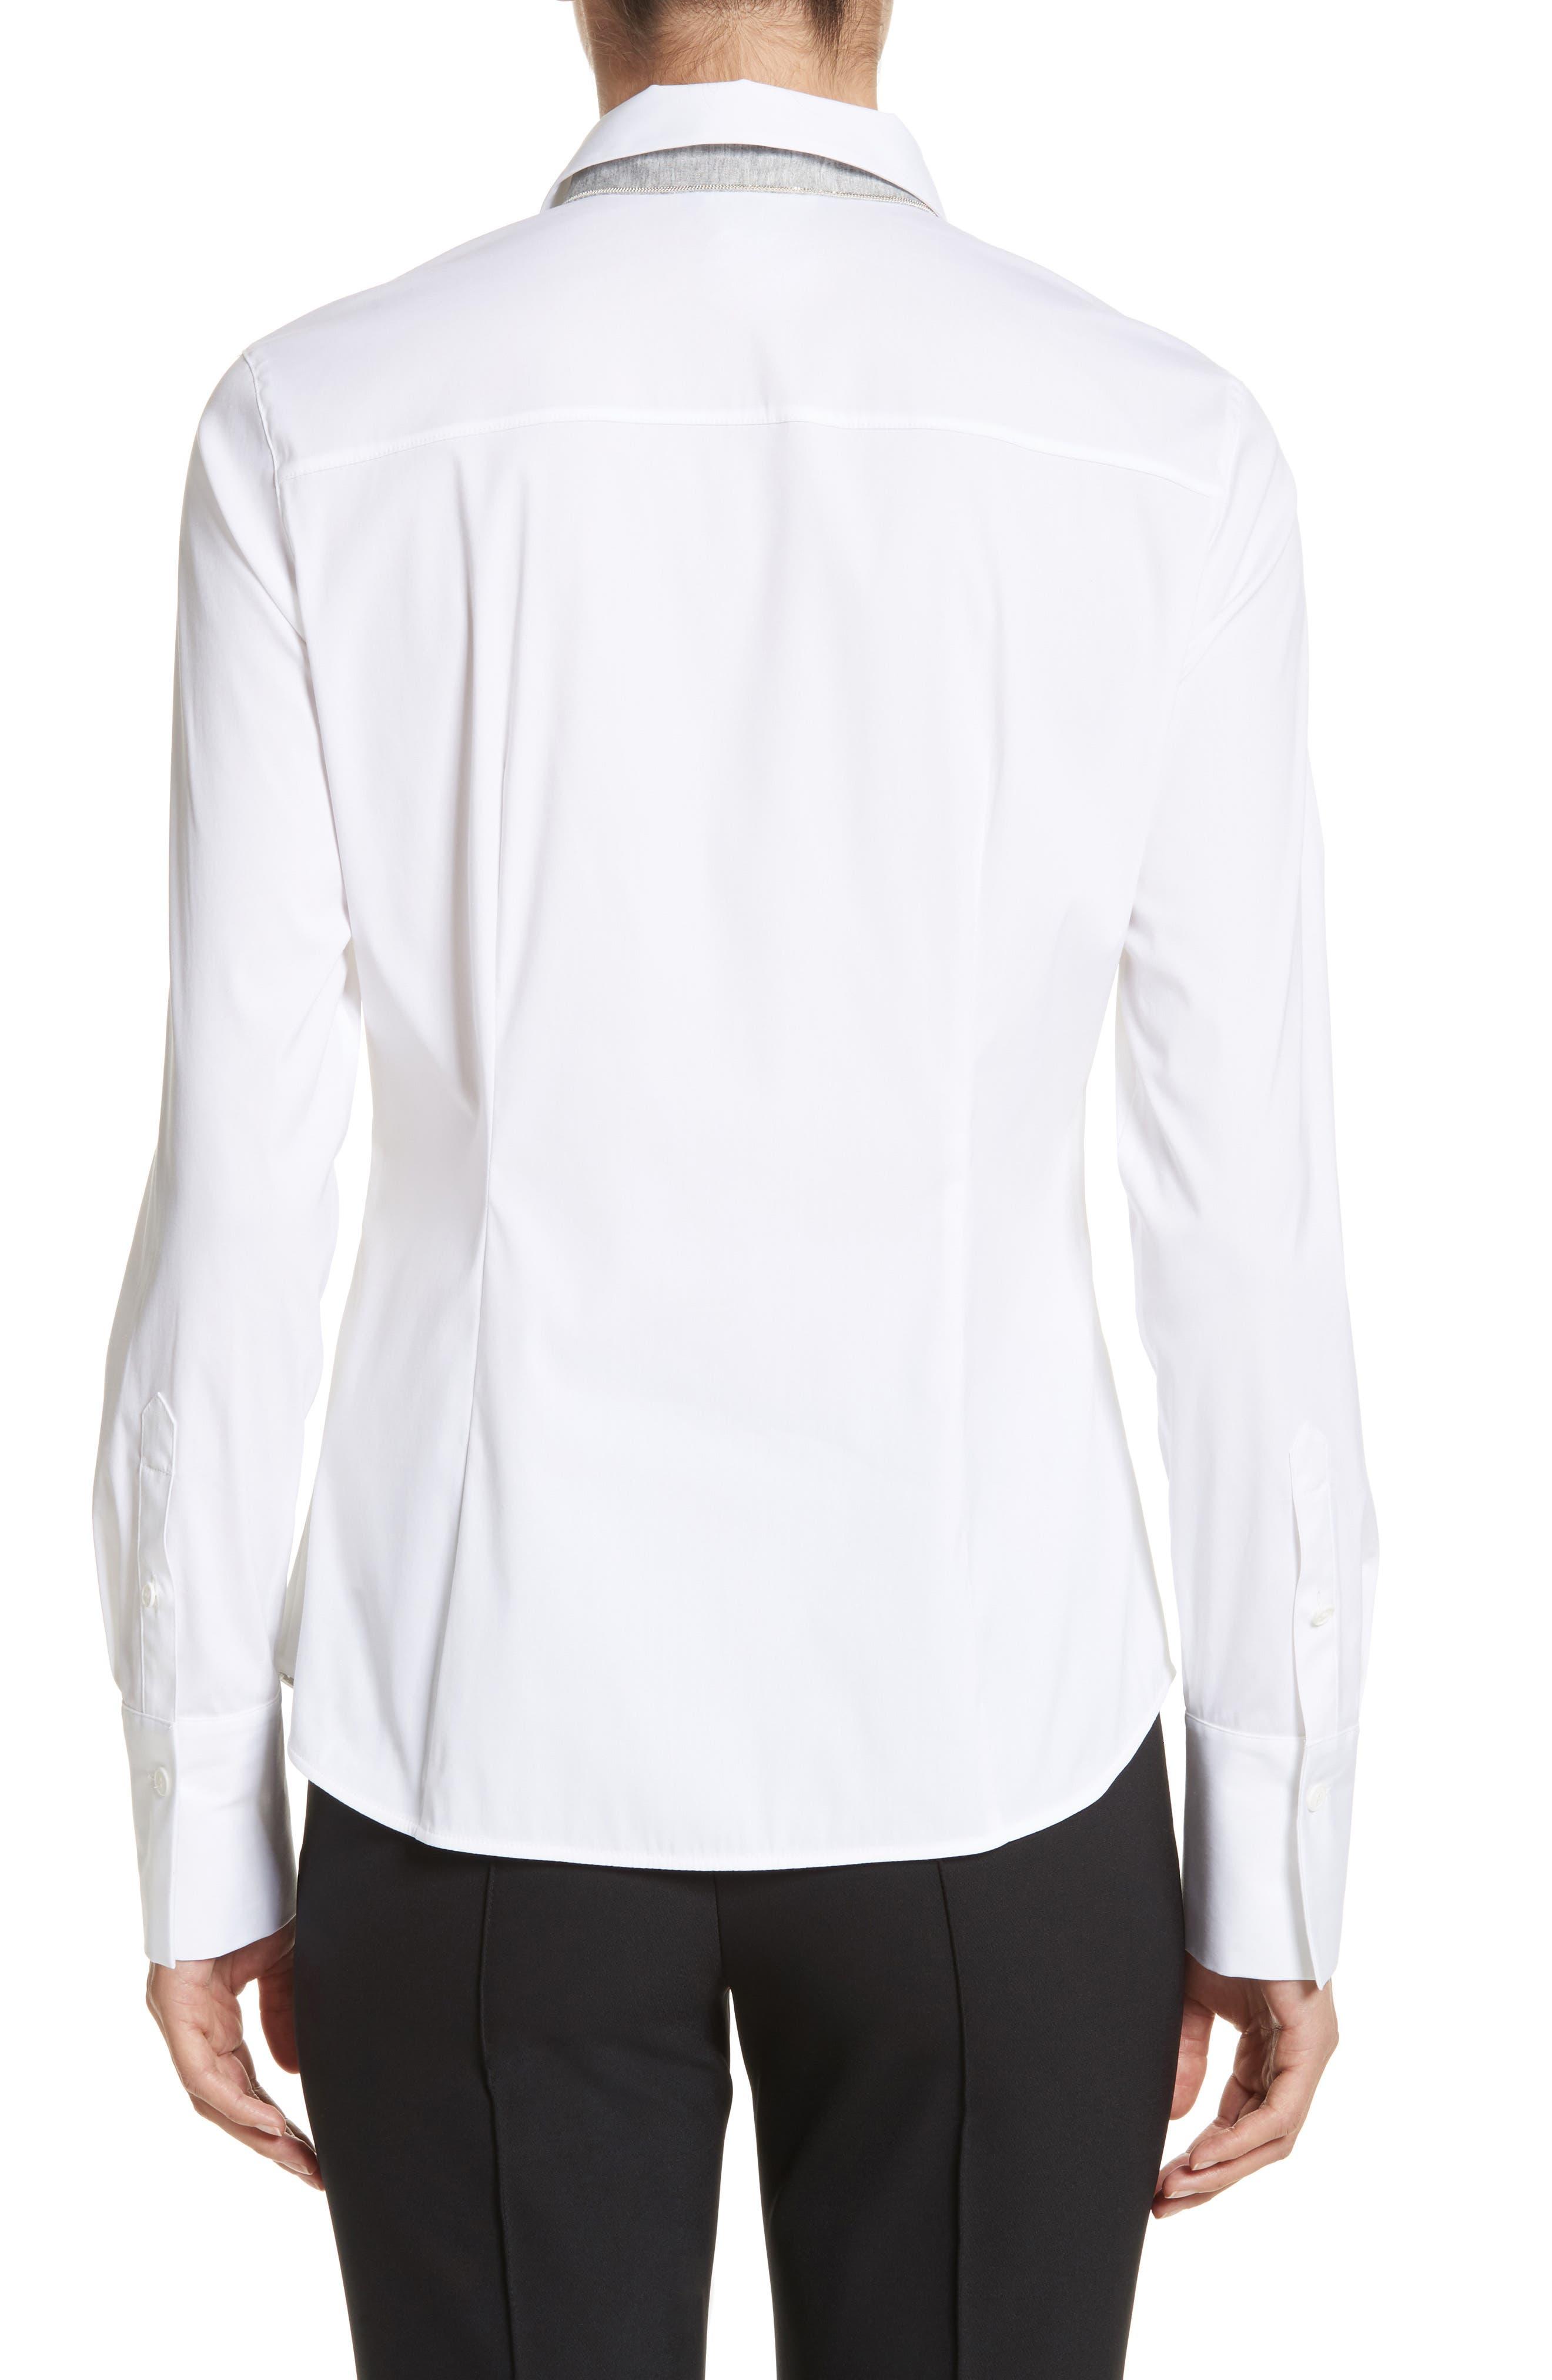 Linley Stretch Cotton Blouse,                             Alternate thumbnail 2, color,                             WHITE